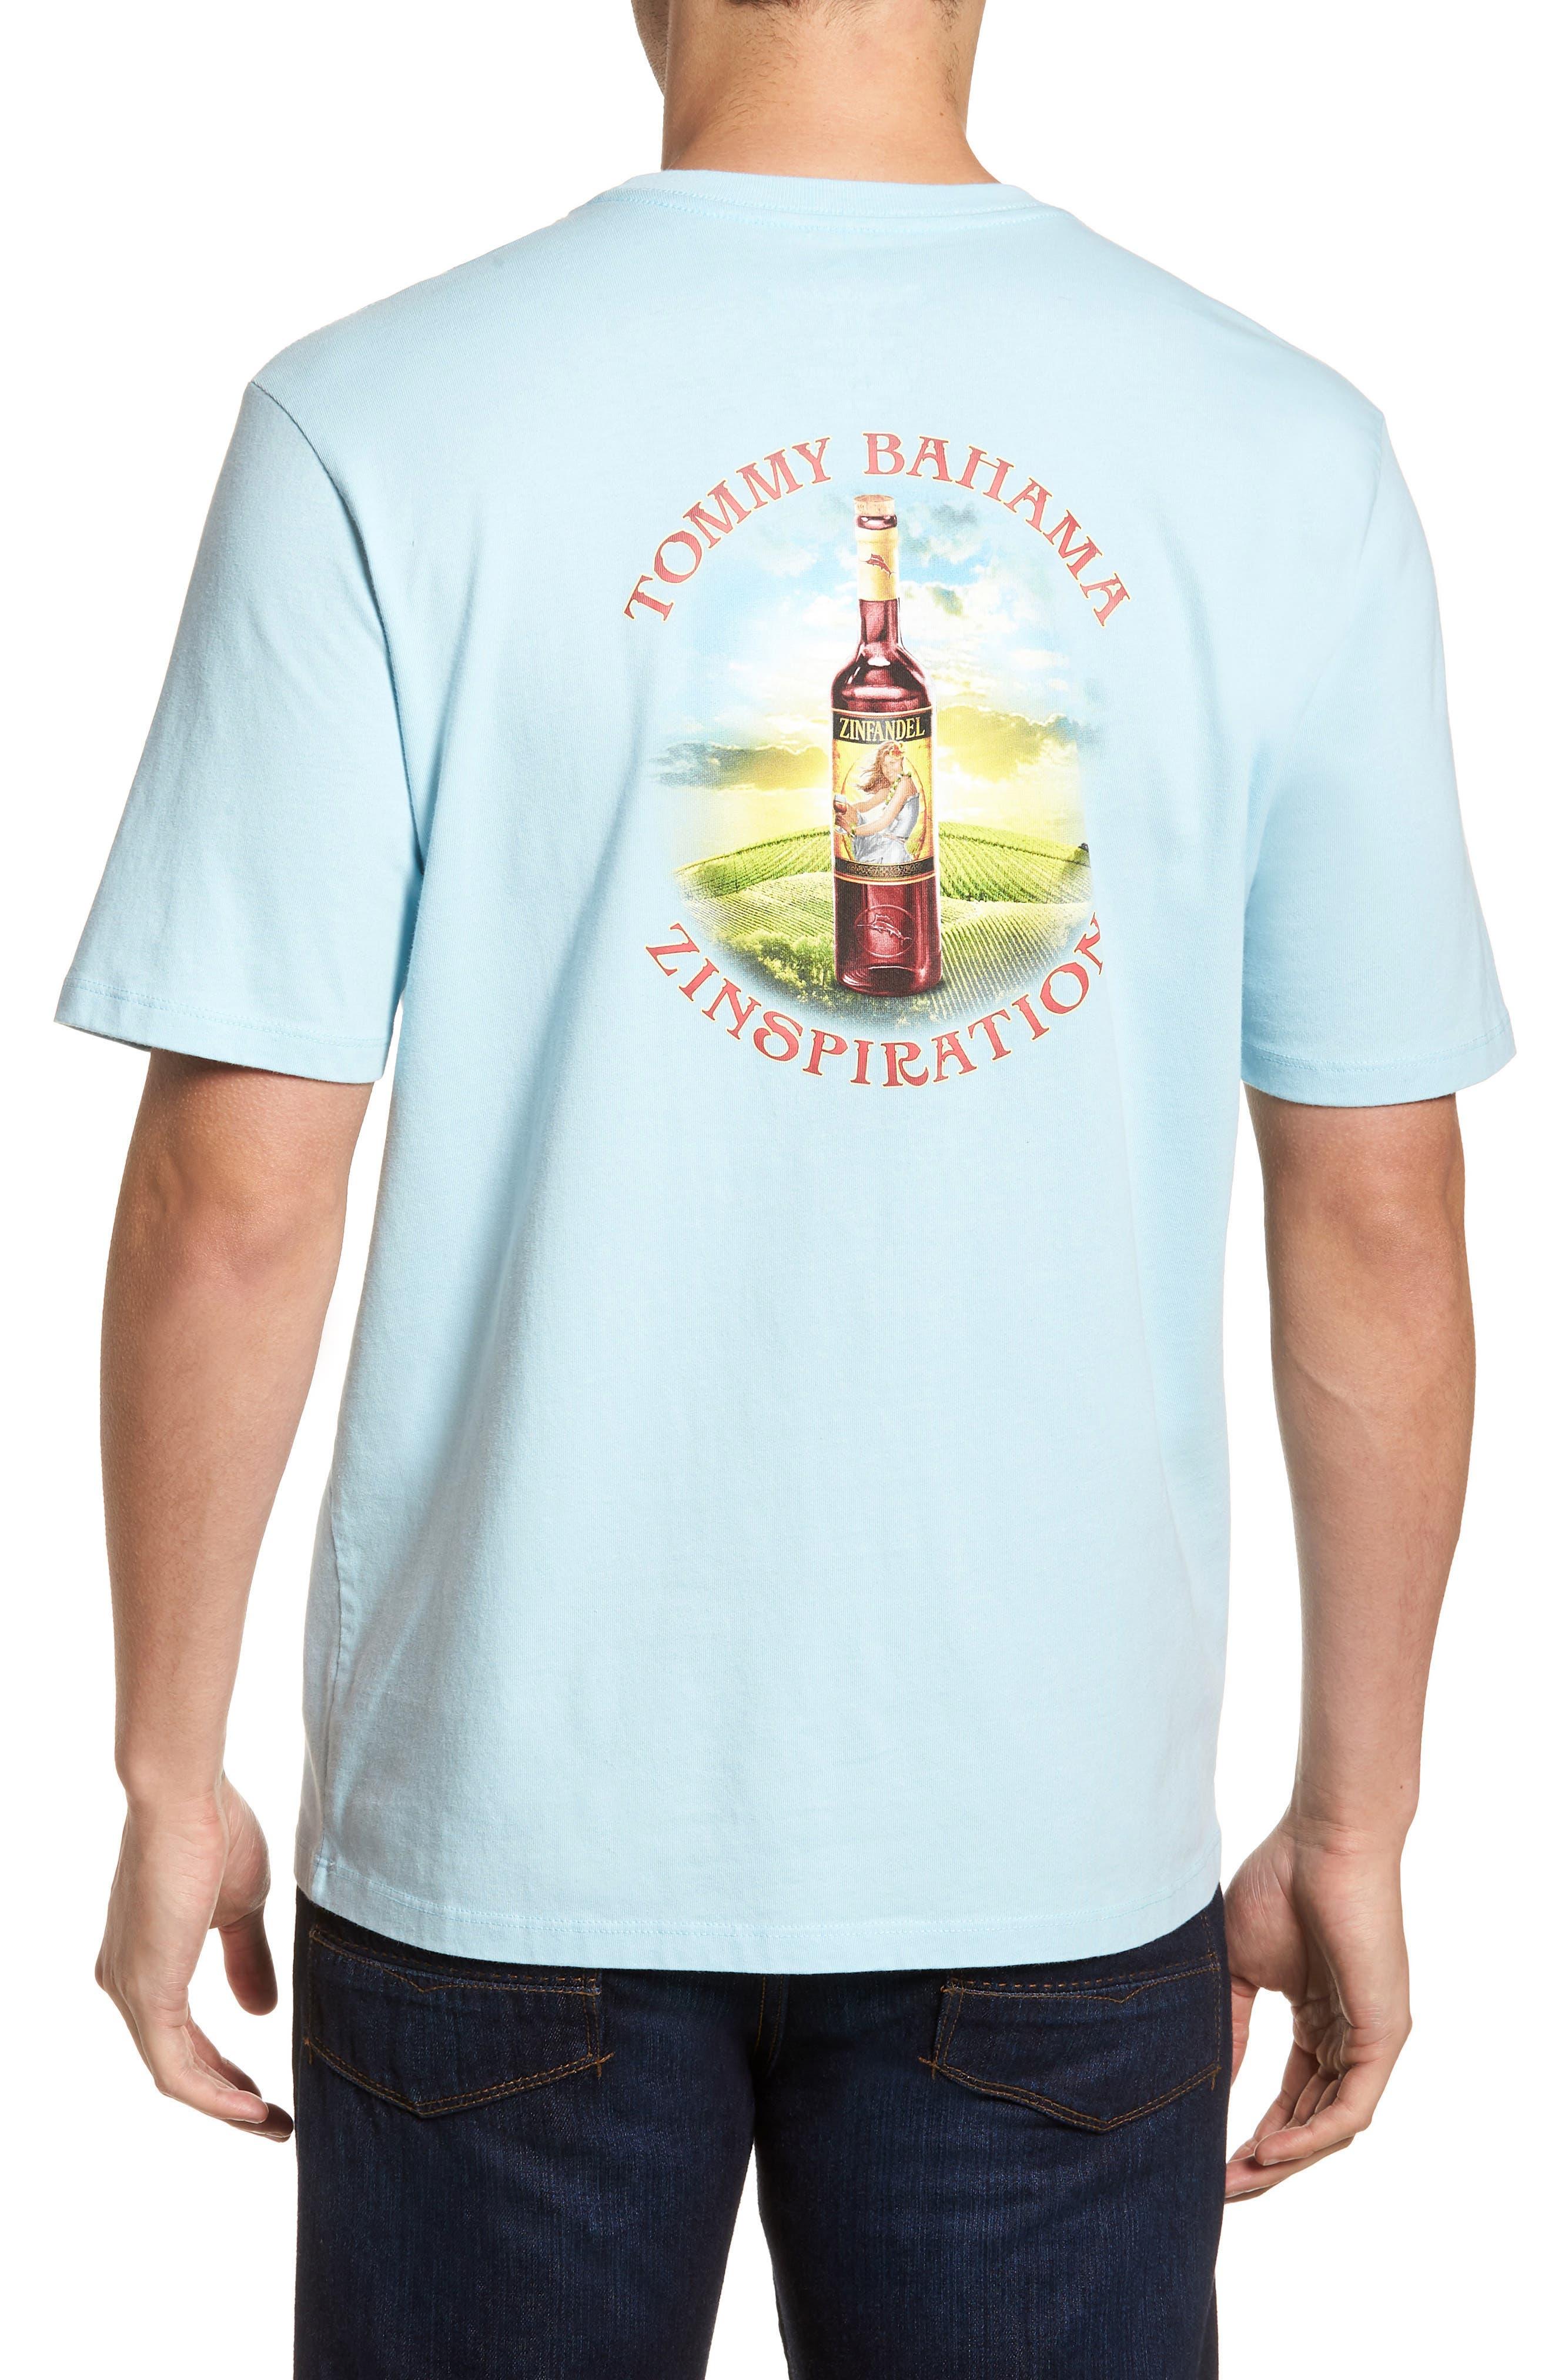 Zinspiration T-Shirt,                             Alternate thumbnail 2, color,                             100